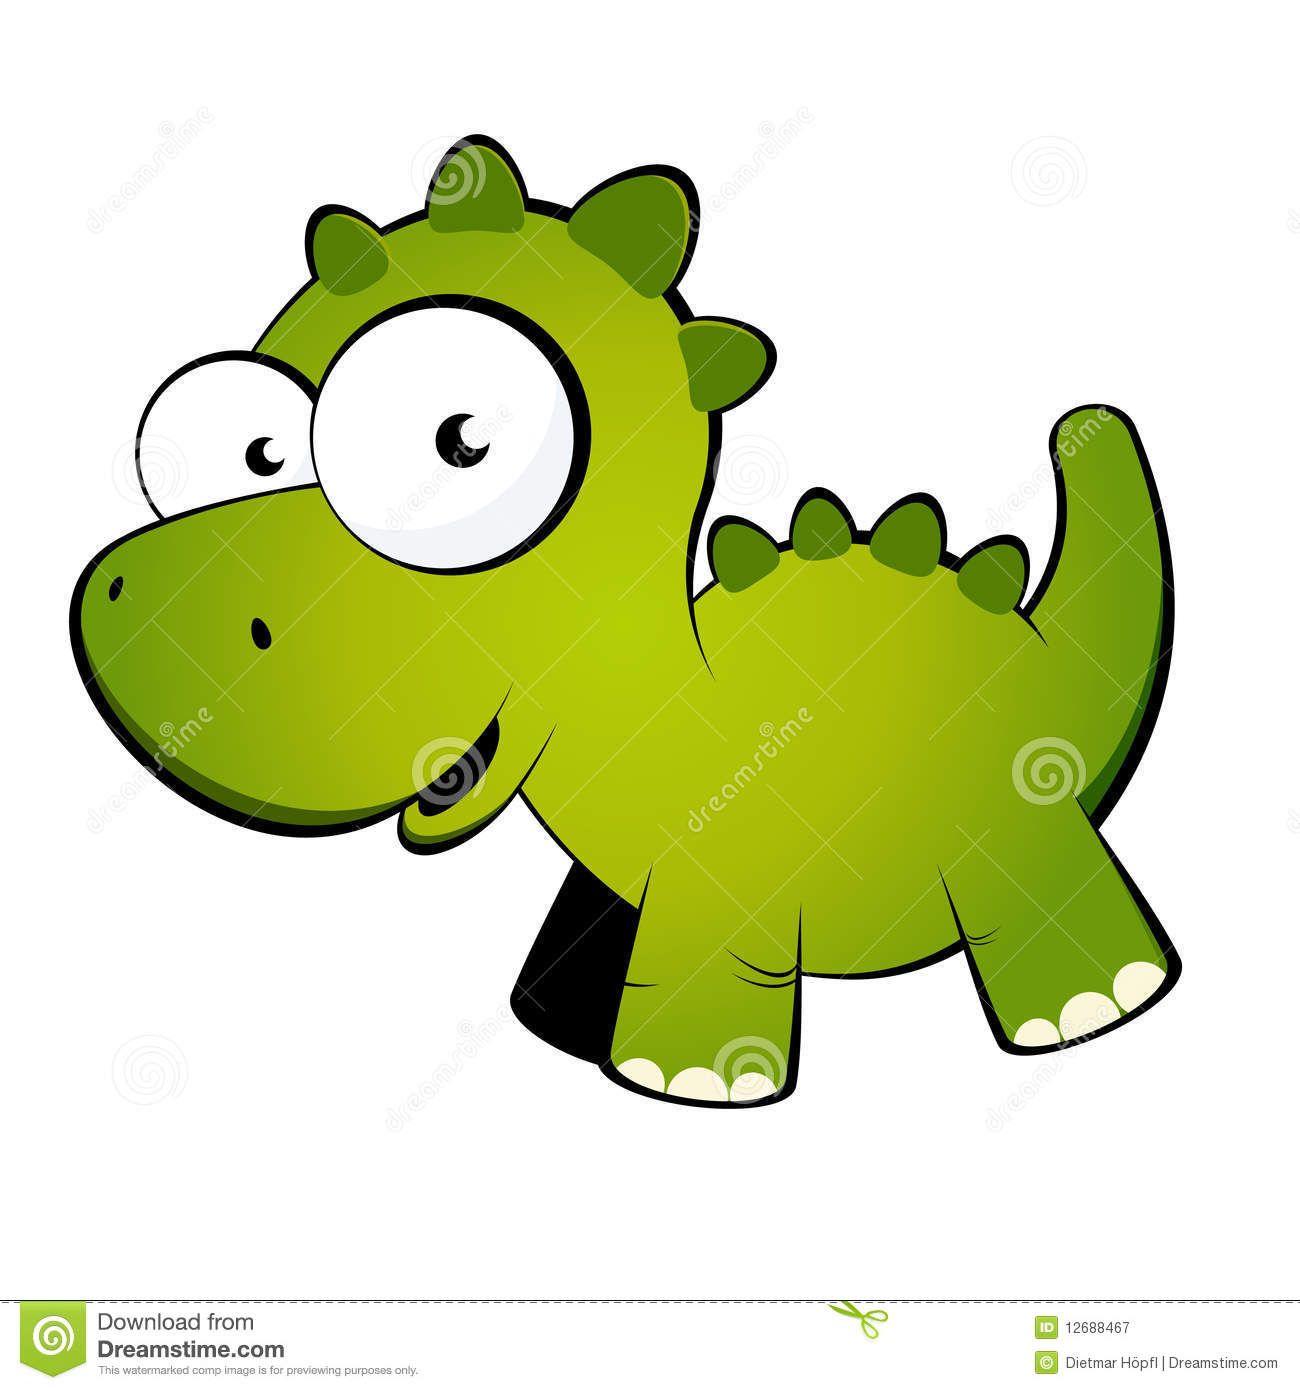 Dinosaur Cartoon Images Cartoon Images Cartoon Cartoon Dinosaur